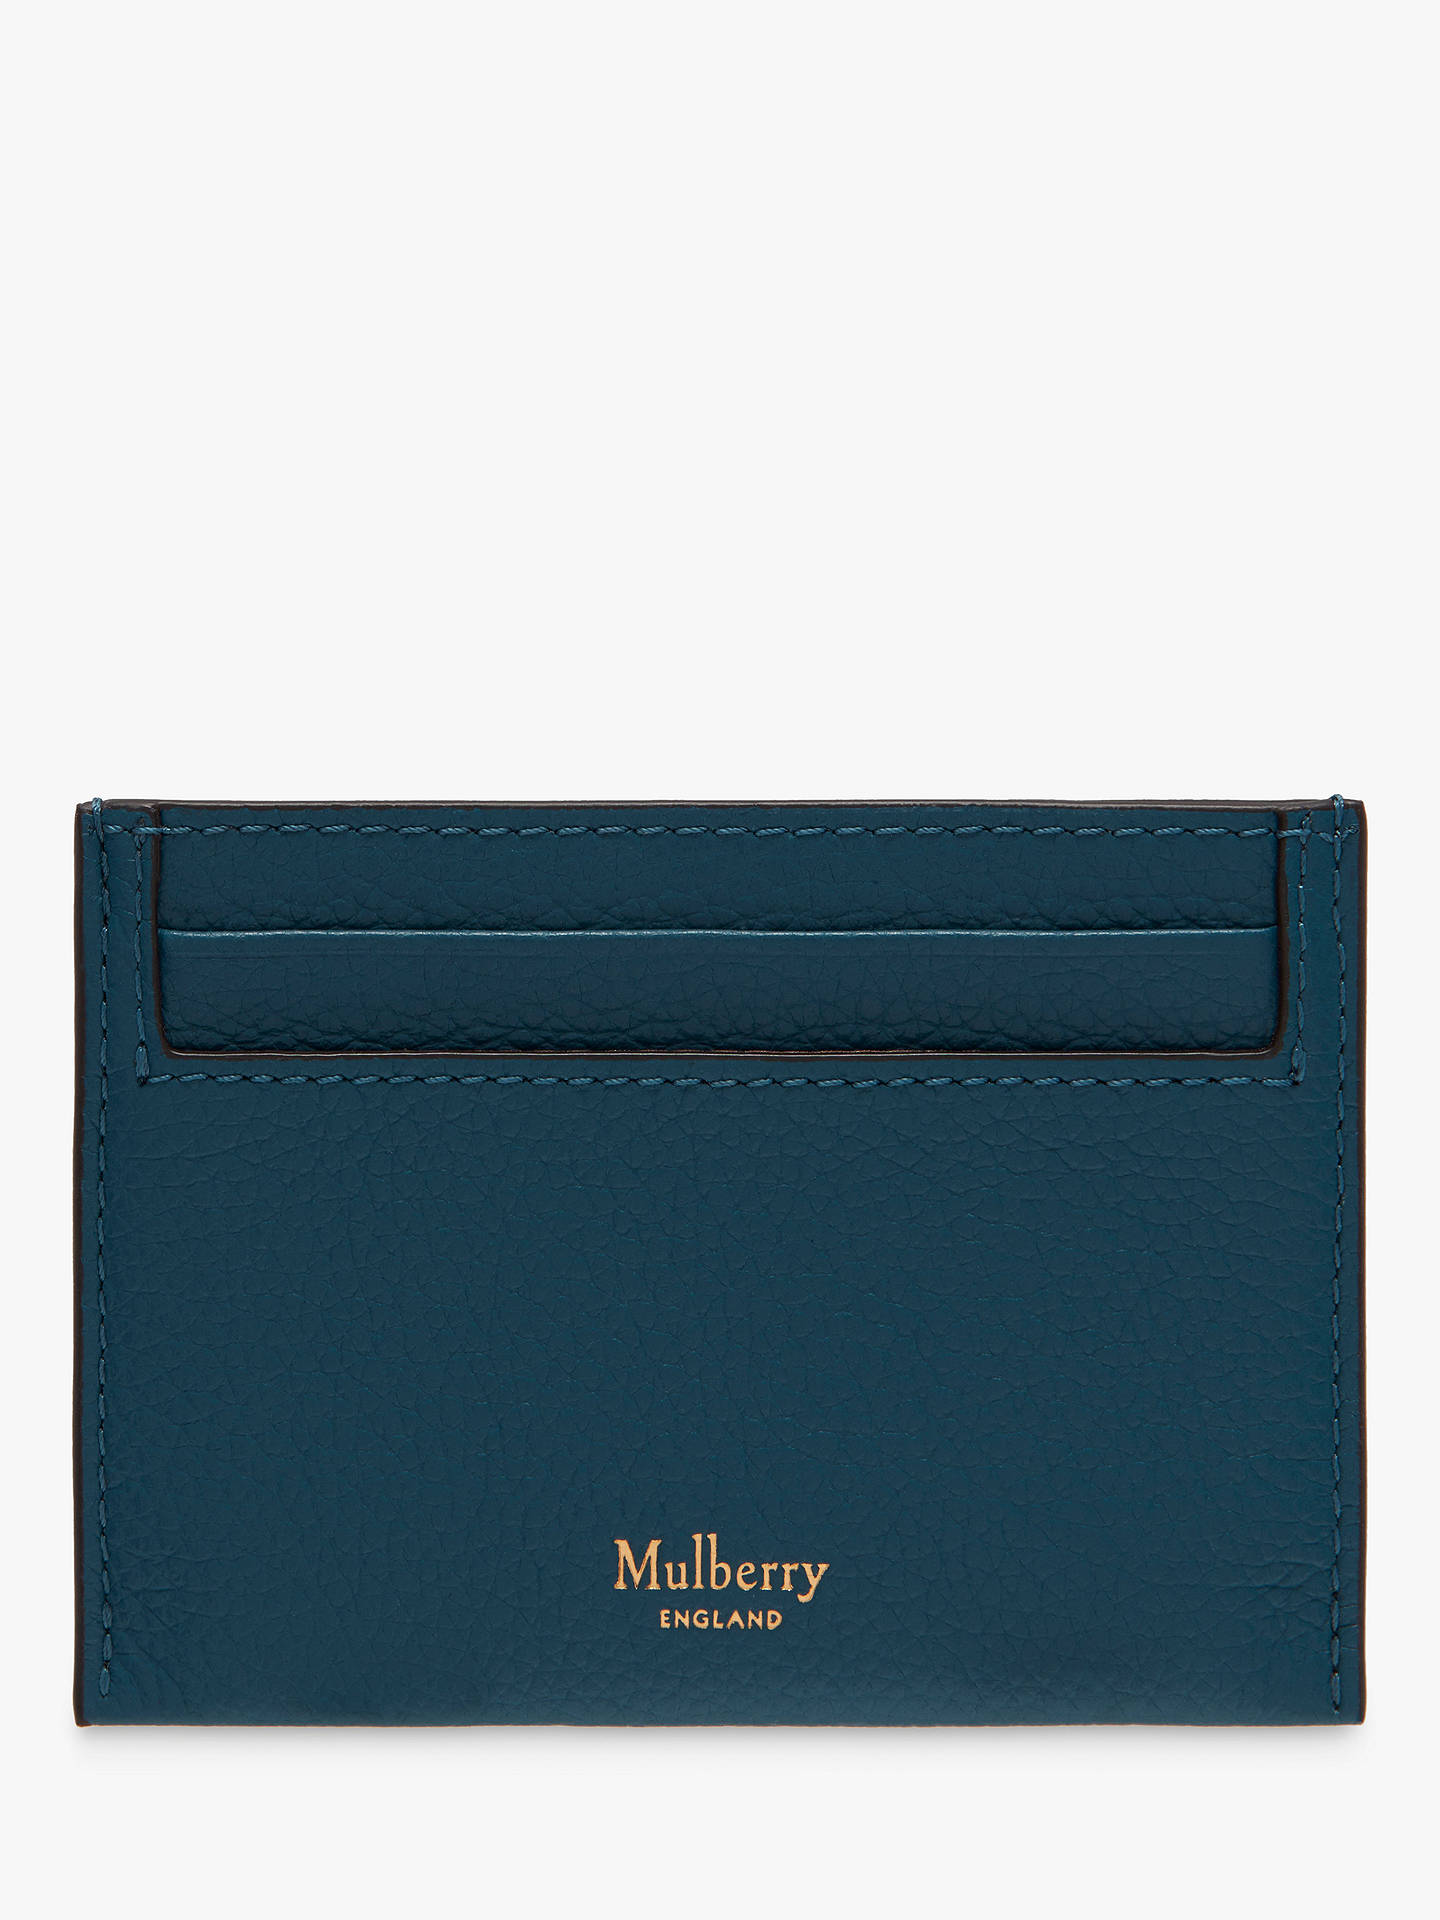 7e7440d210396 Mulberry Continental Small Classic Grain Leather Credit Card Slip ...